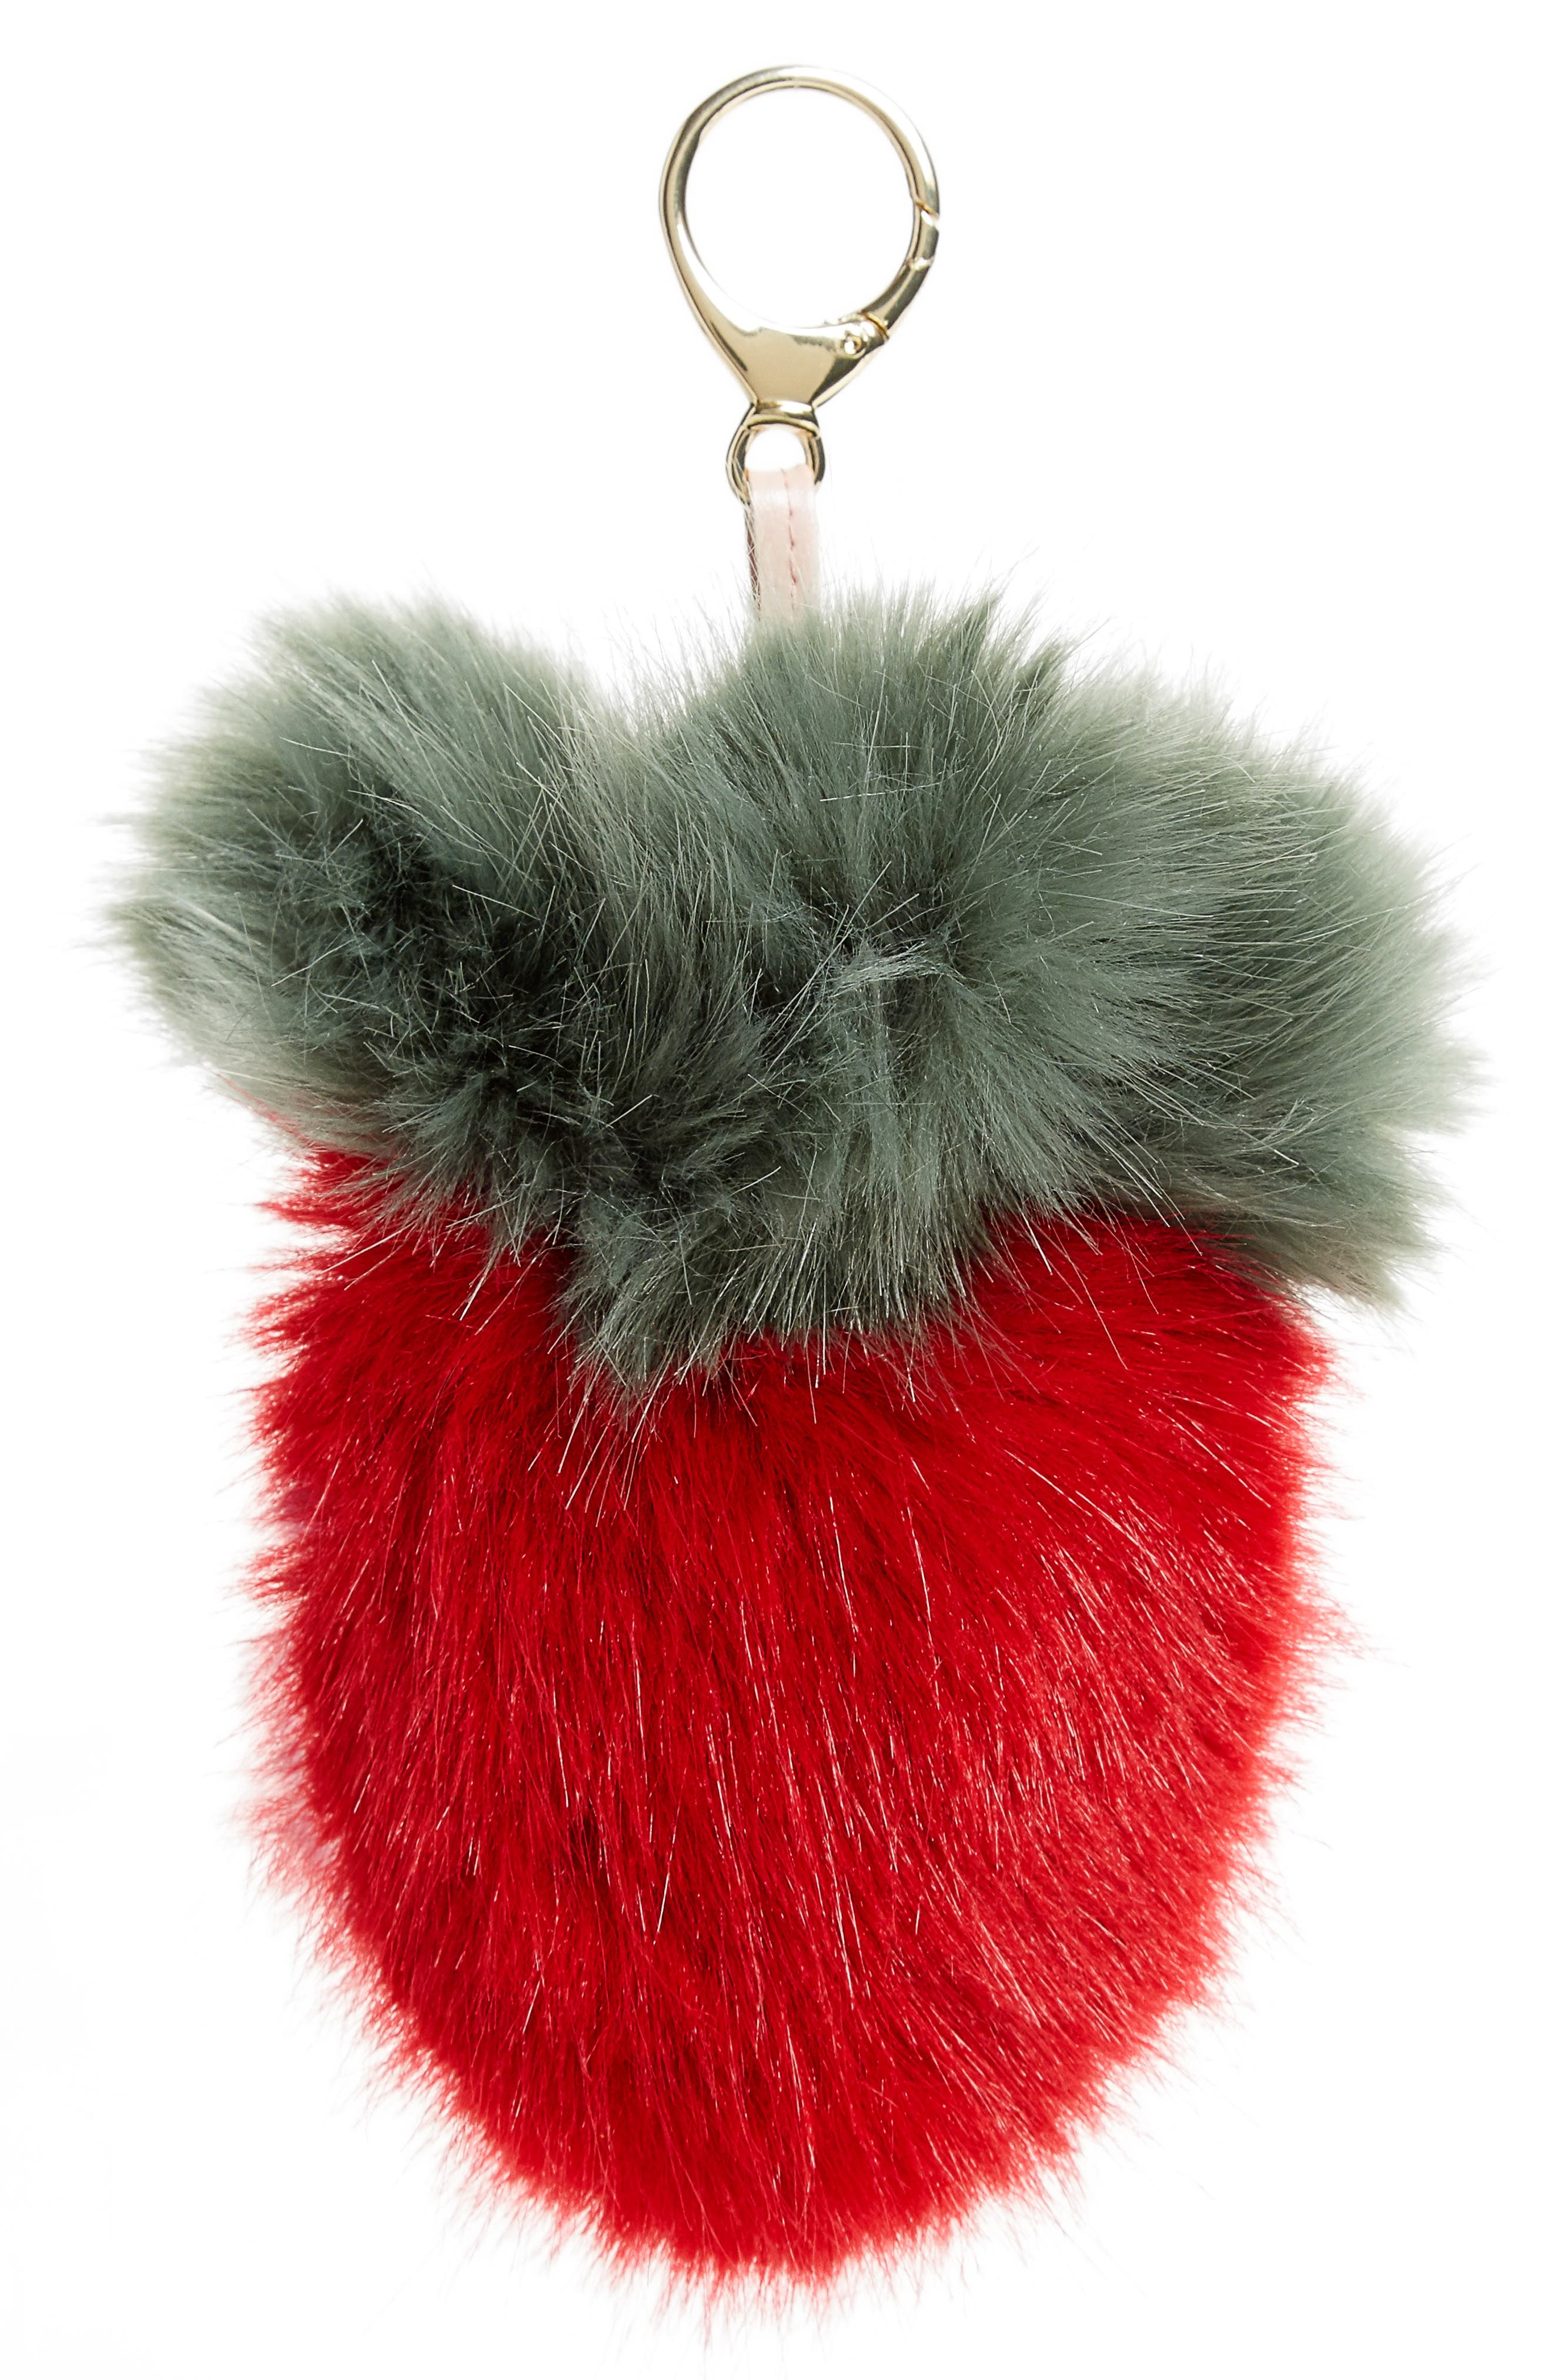 Alternate Image 1 Selected - Shrimps Strawberry Faux Fur Bag Charm